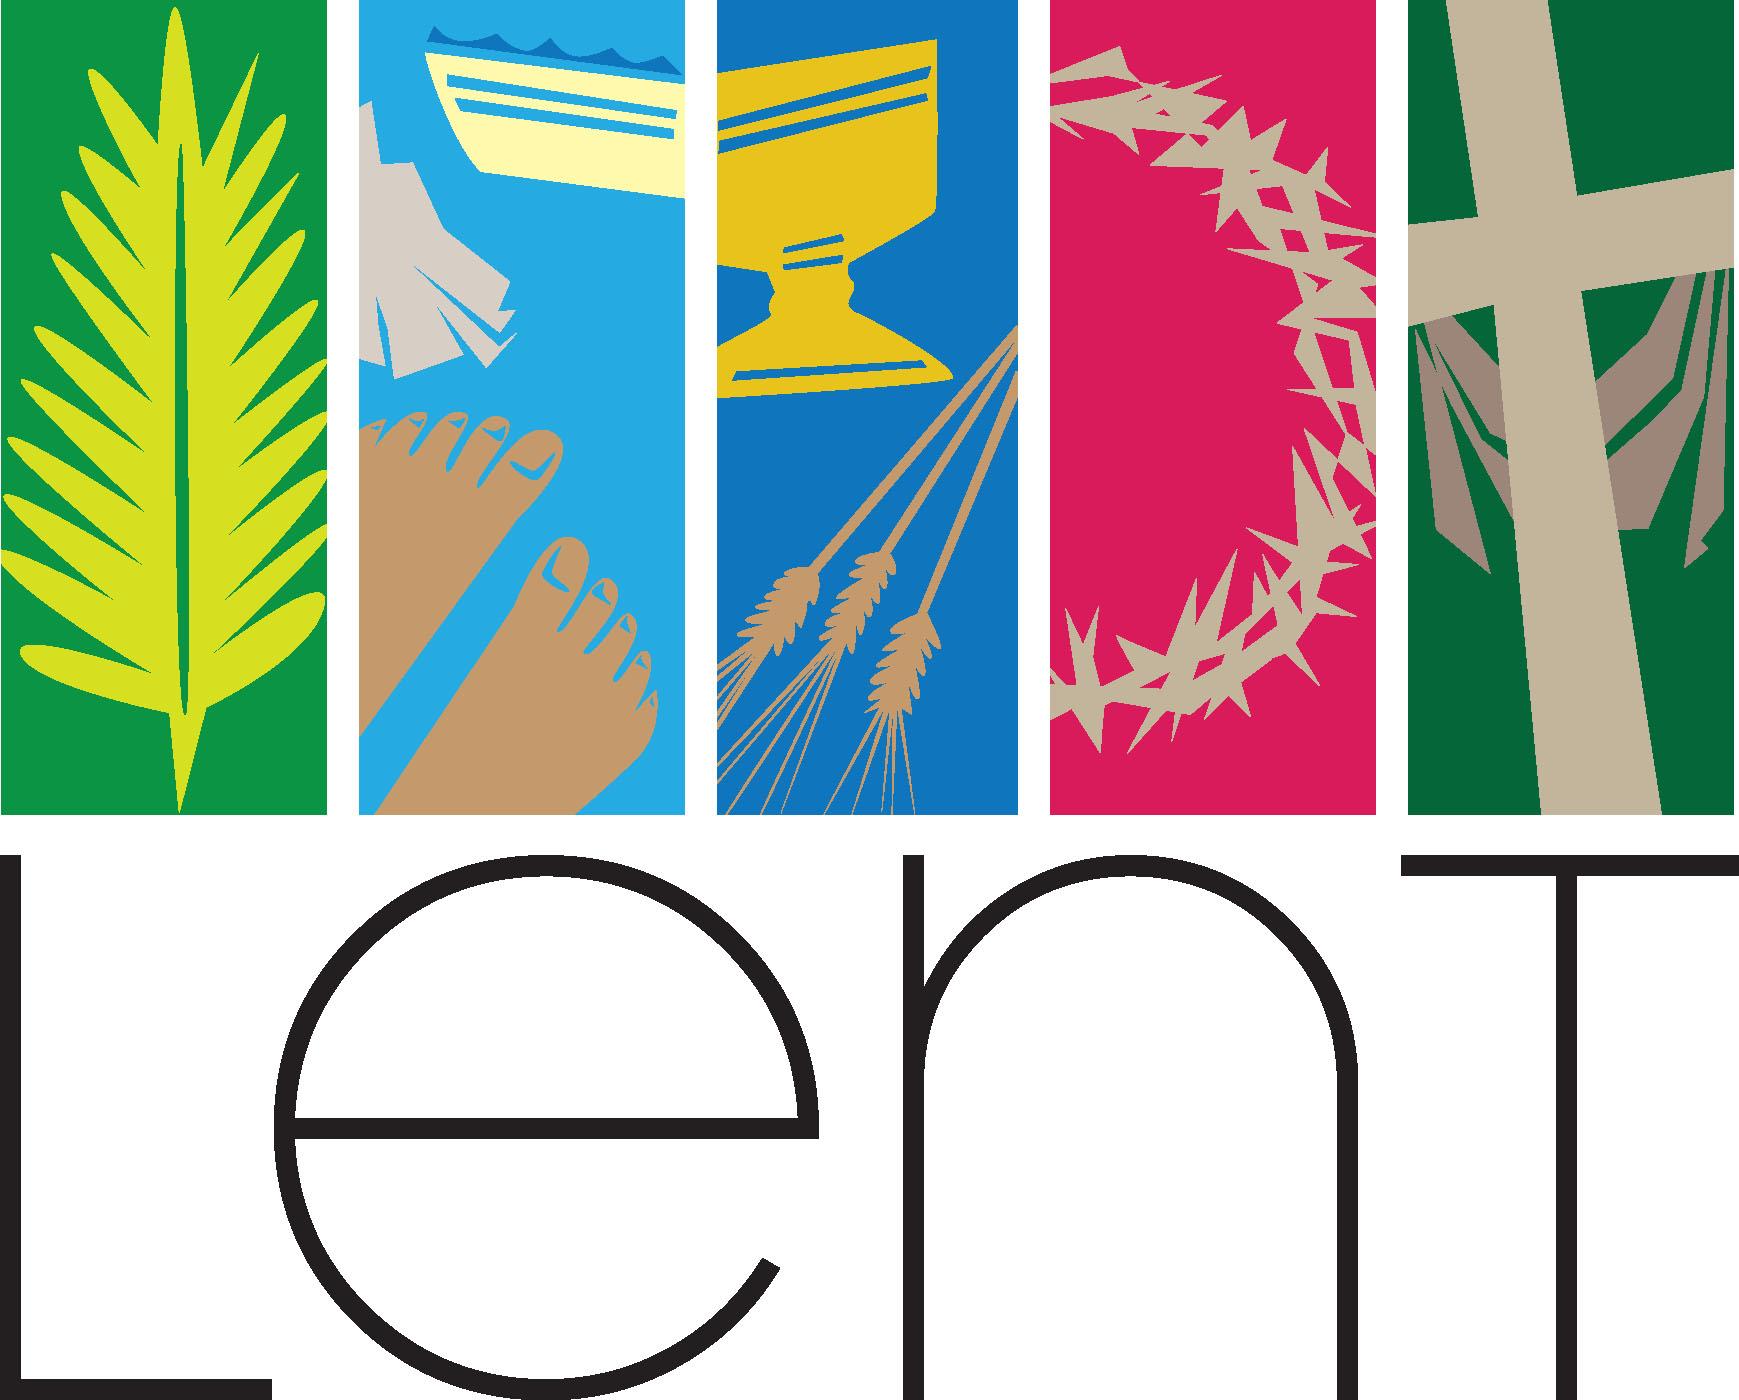 Lenten Clipart Free-Lenten Clipart Free-13